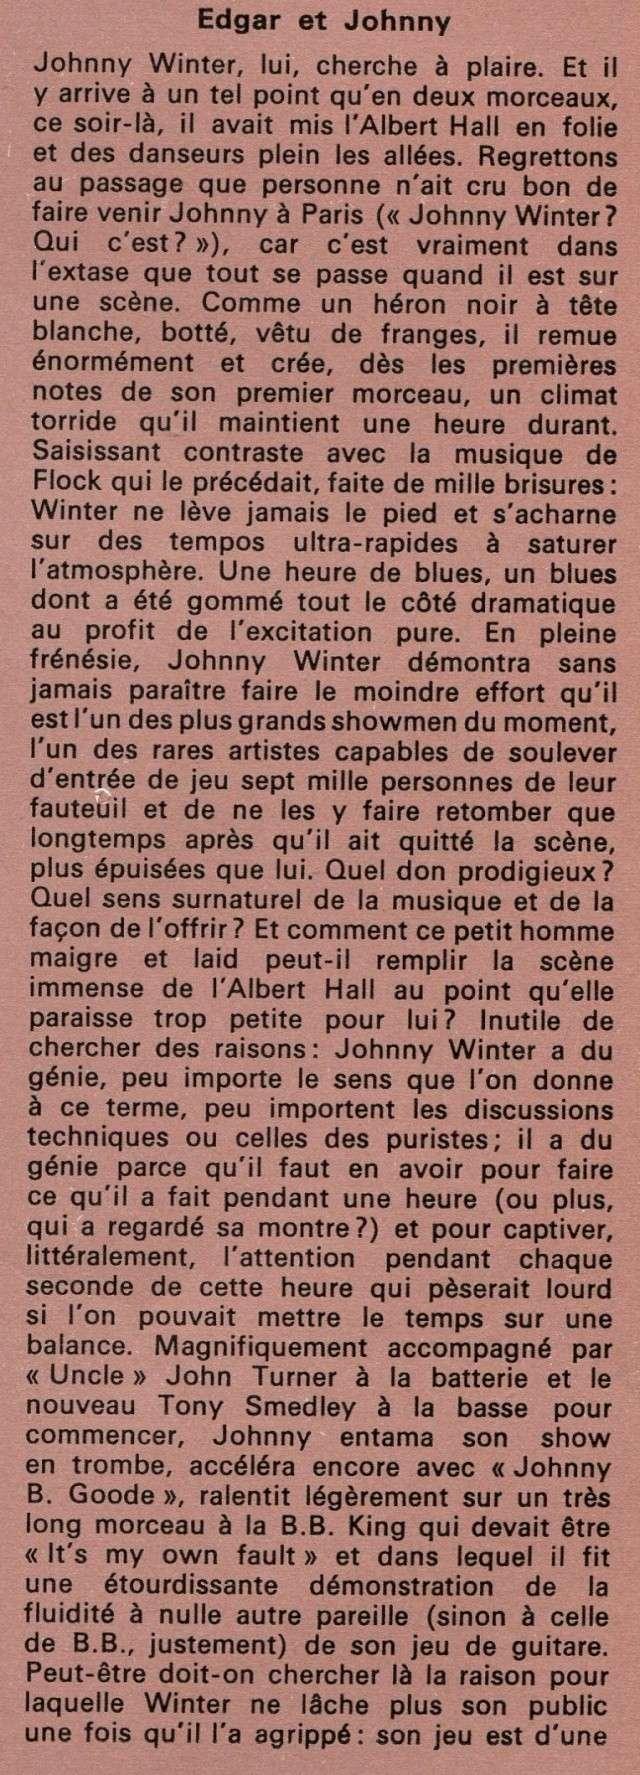 Johnny Winter (1969) R40-0212